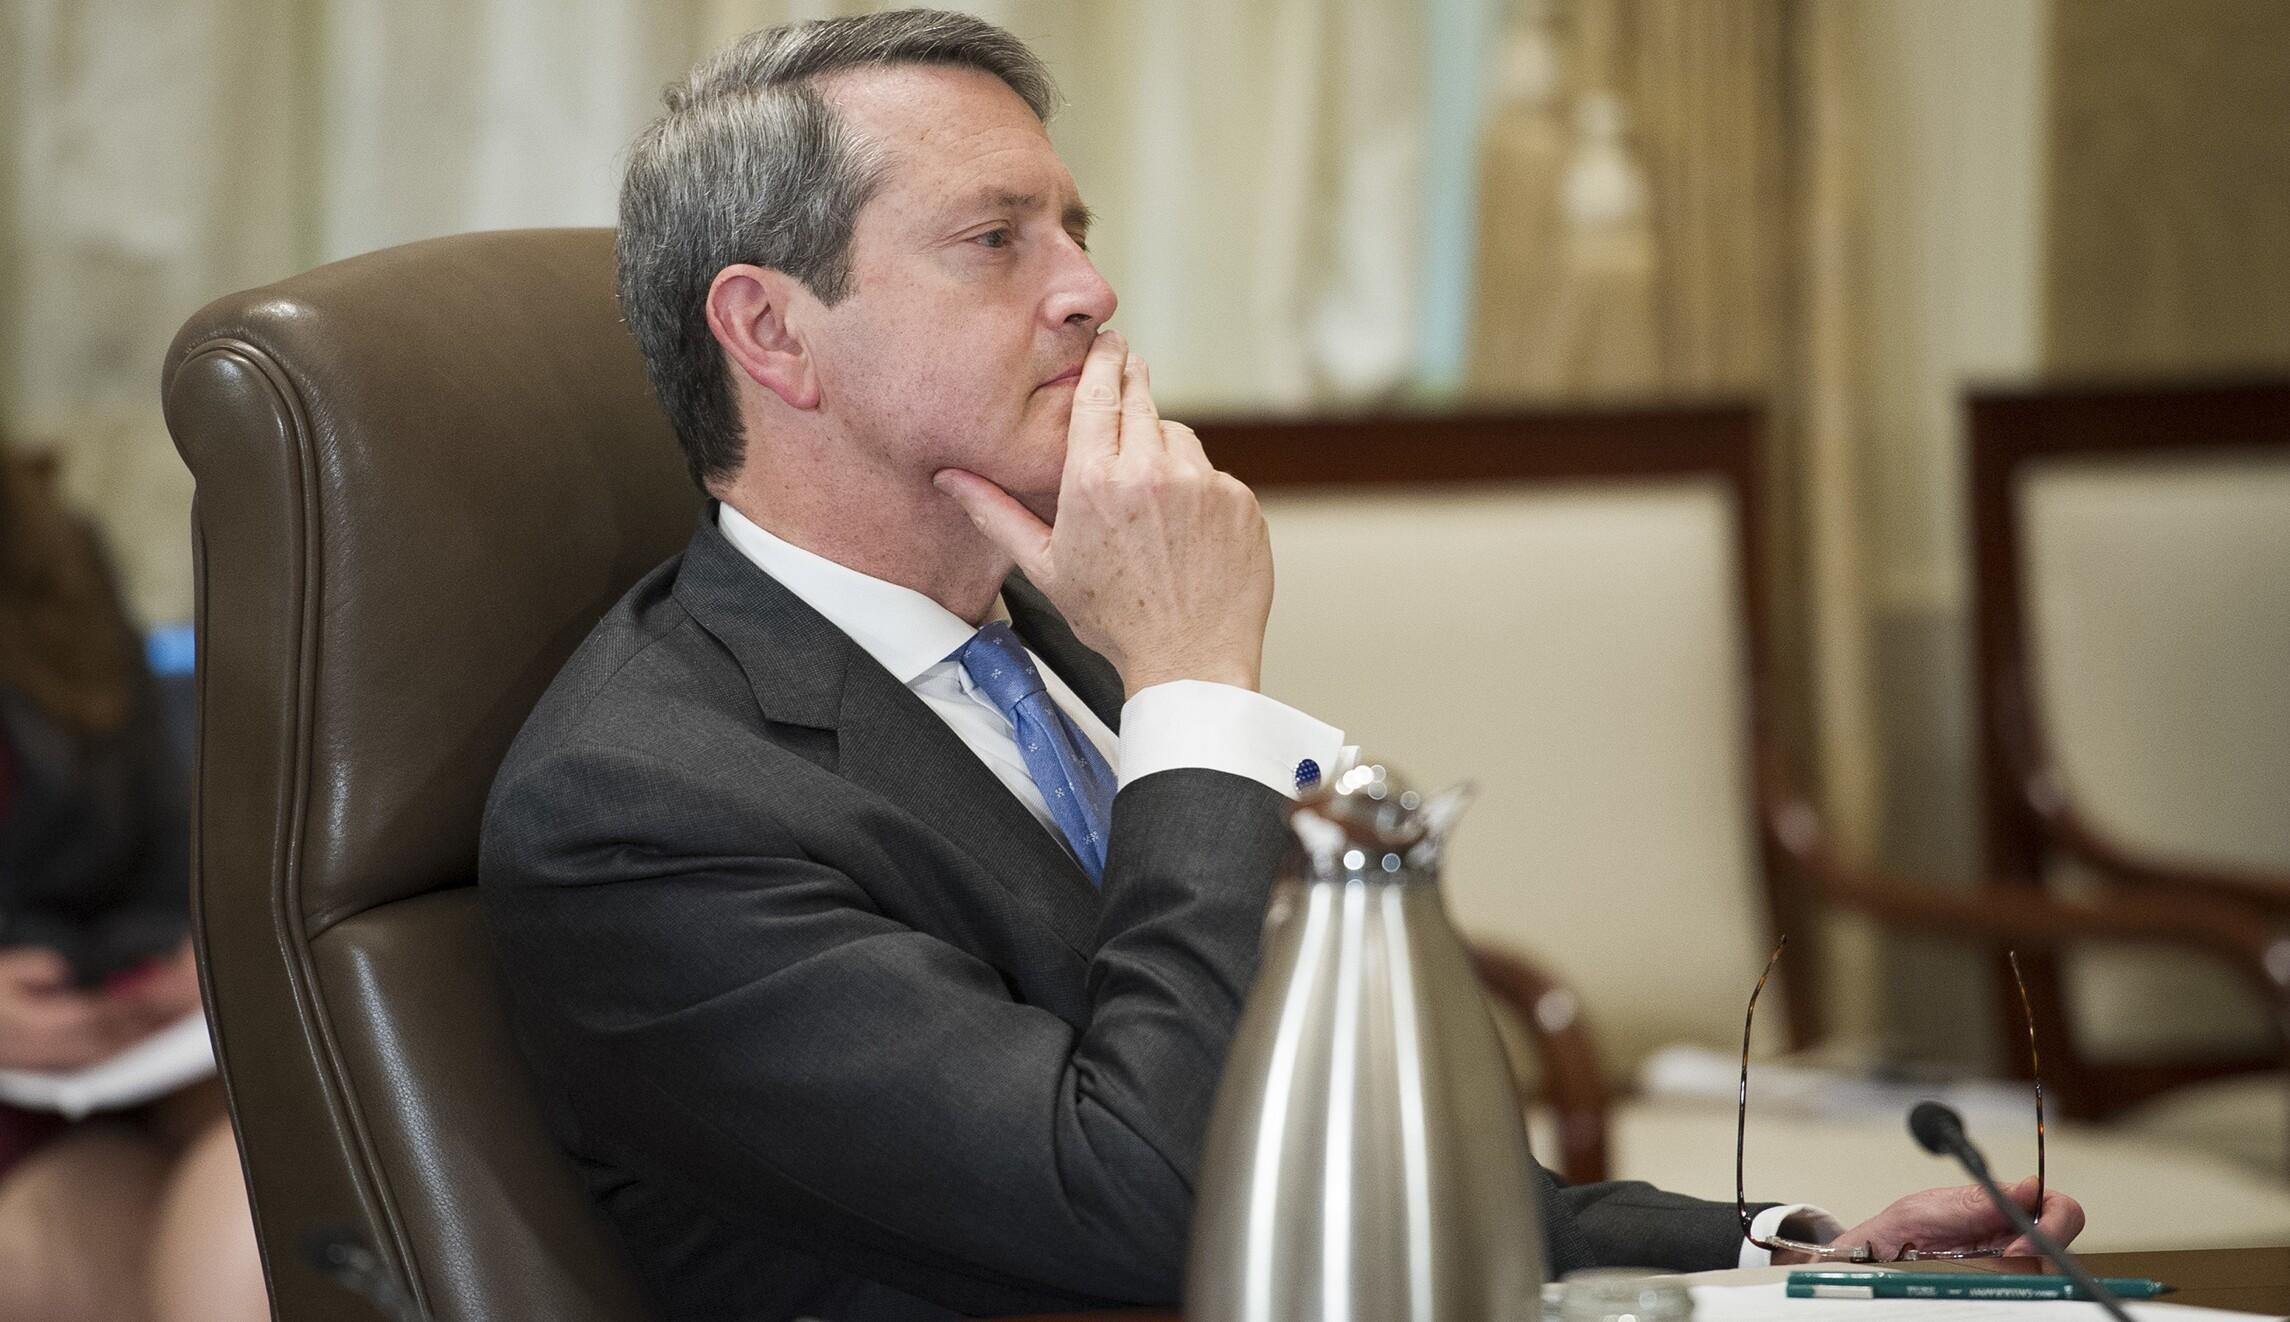 Senator Looks To Ease Burden For >> Senate Confirms Top Trump Financial Regulator Randal Quarles To